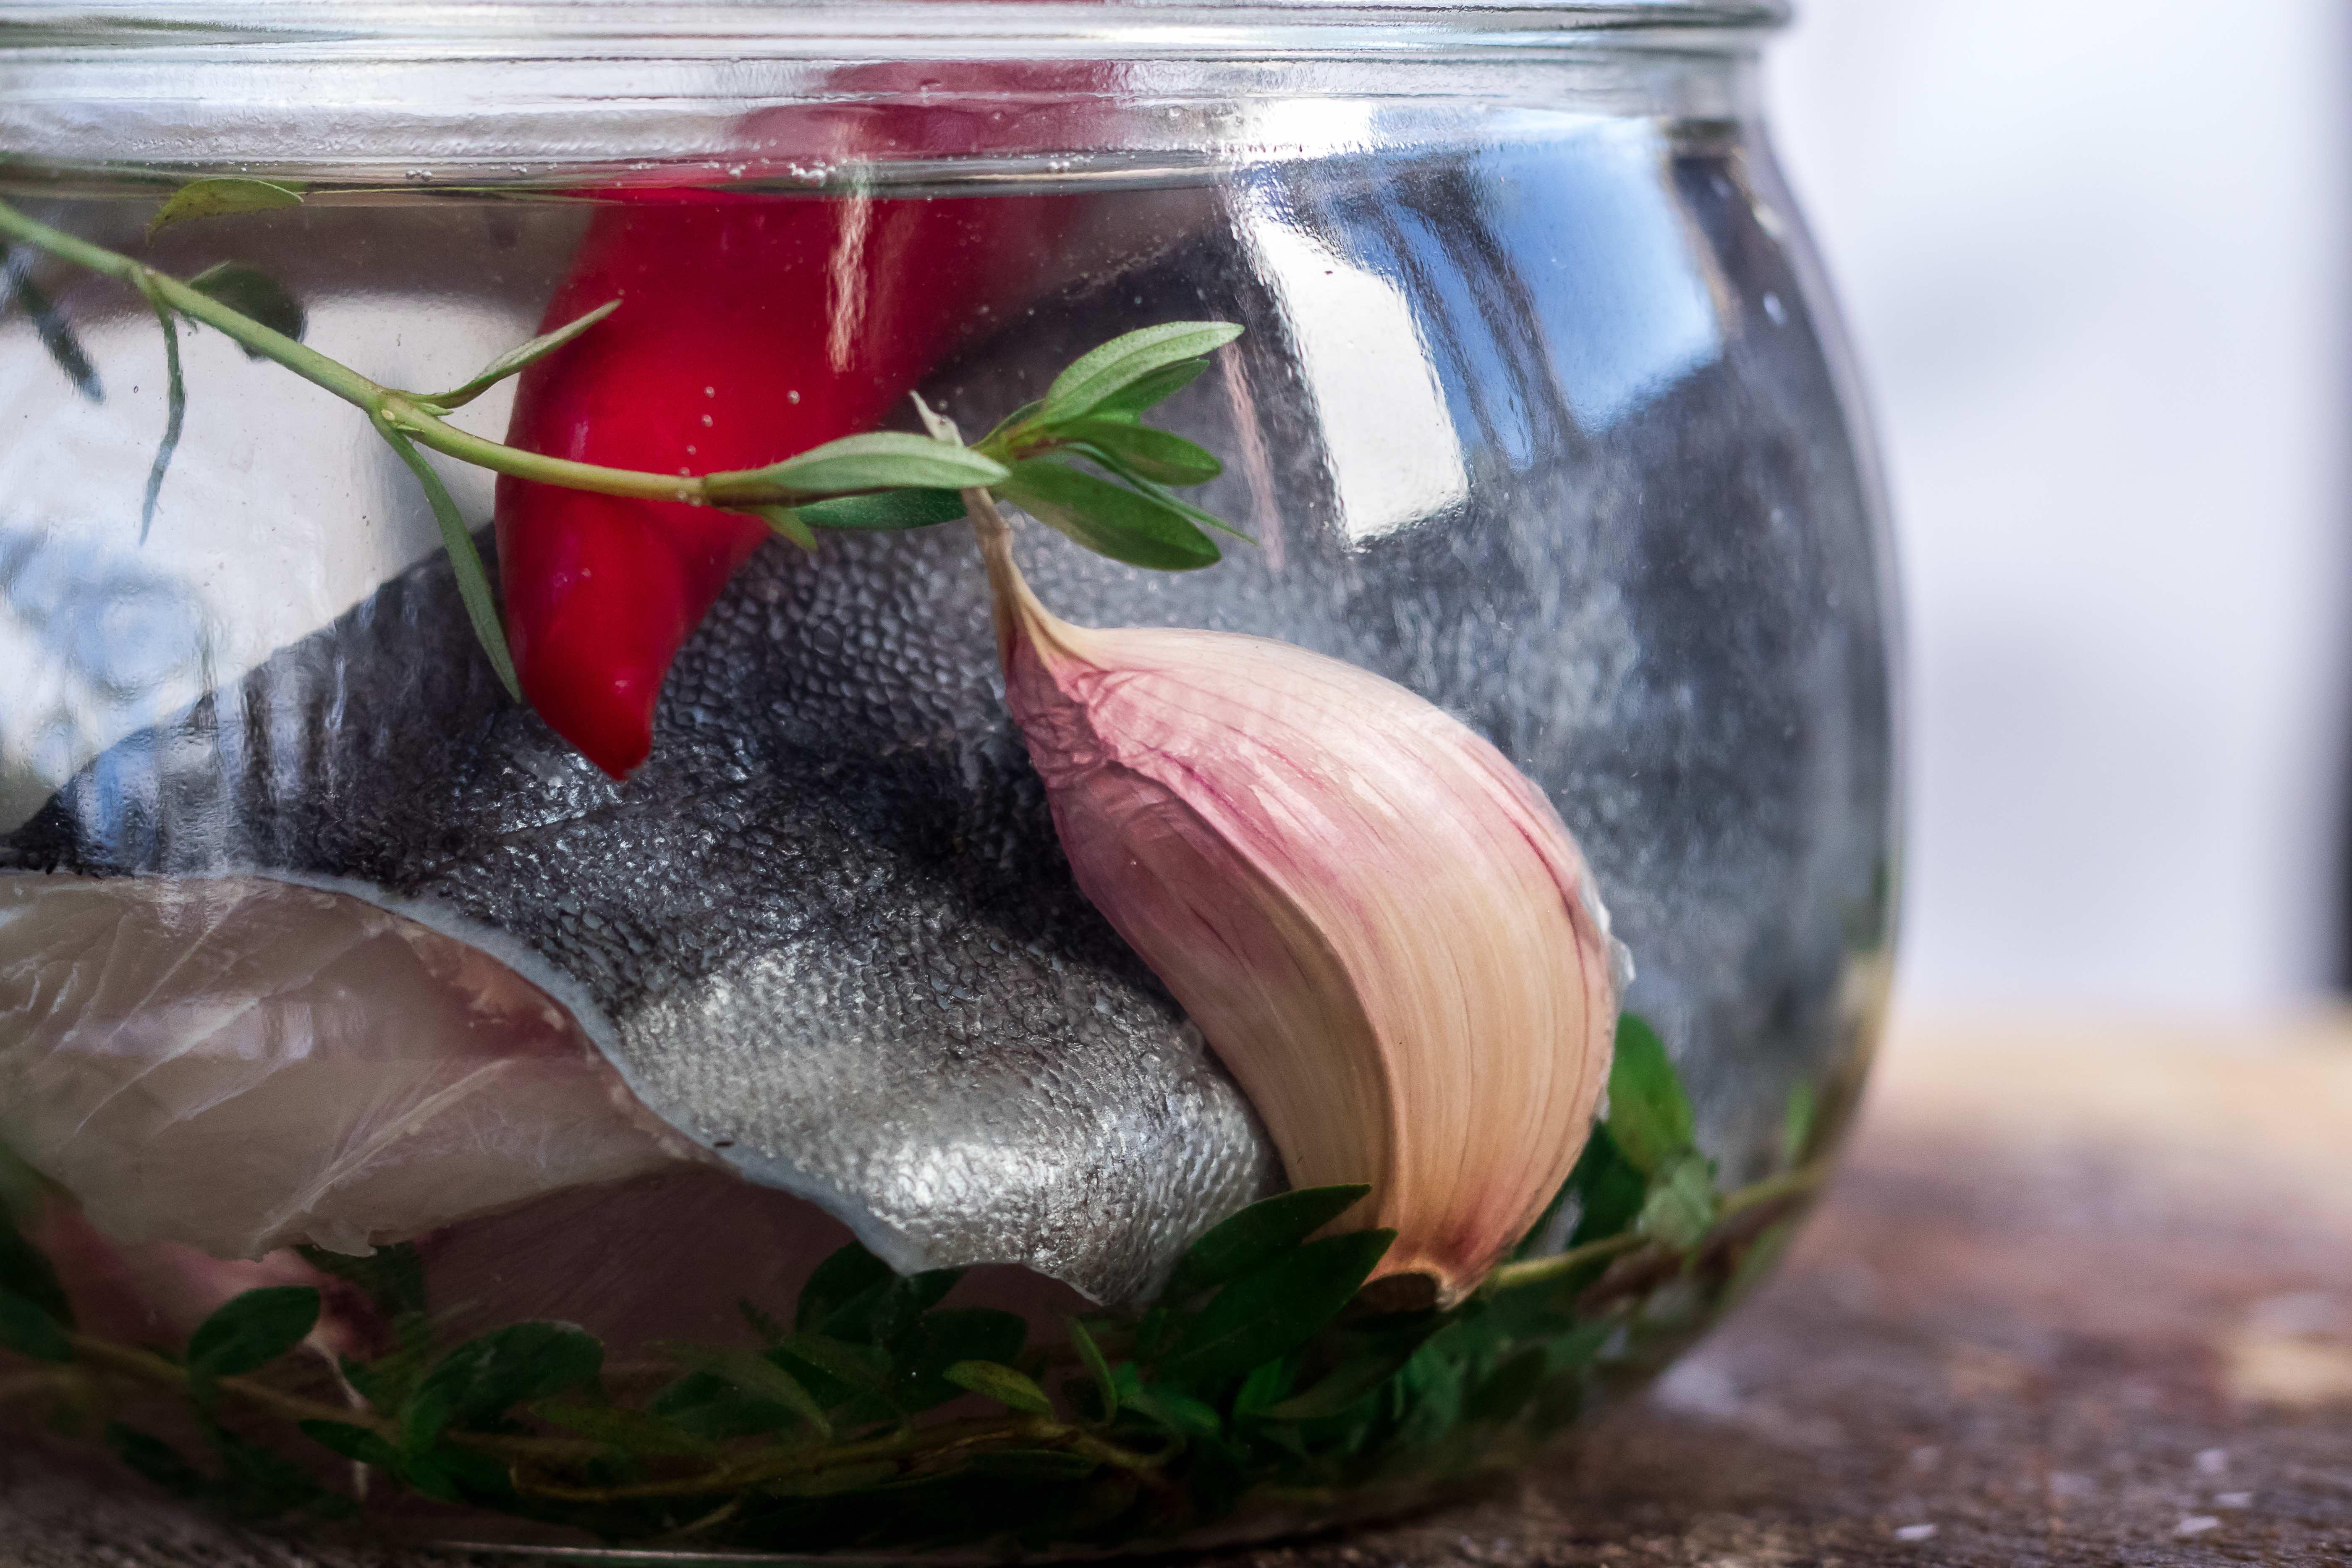 pesce ombra fermentato foto Roberta Sorge